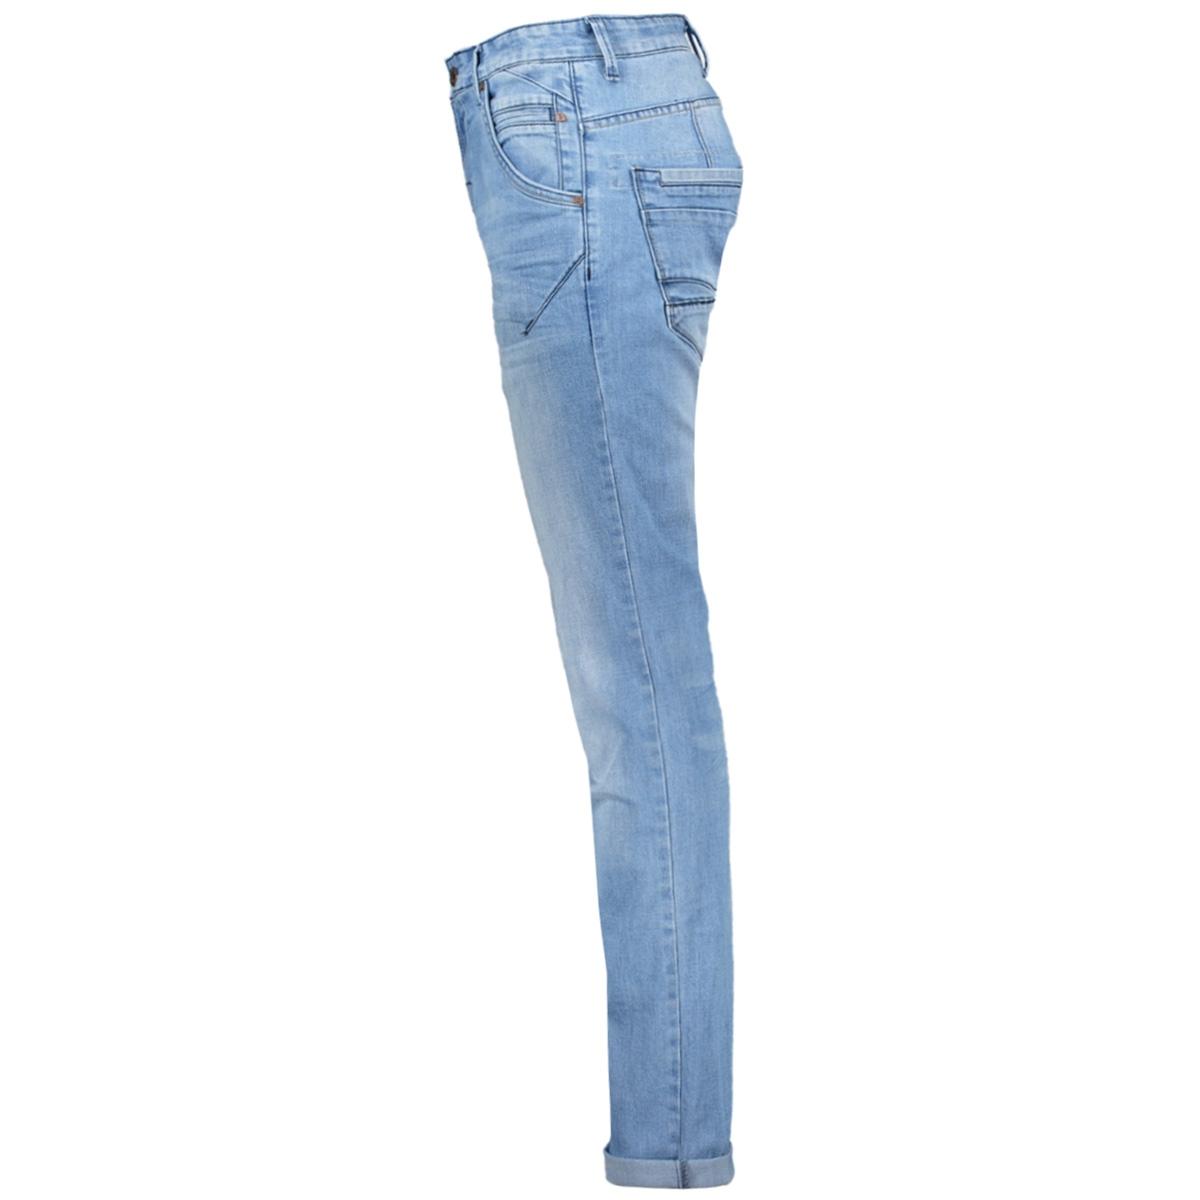 loyd regular str 74438 cars jeans 05 stw/bl used